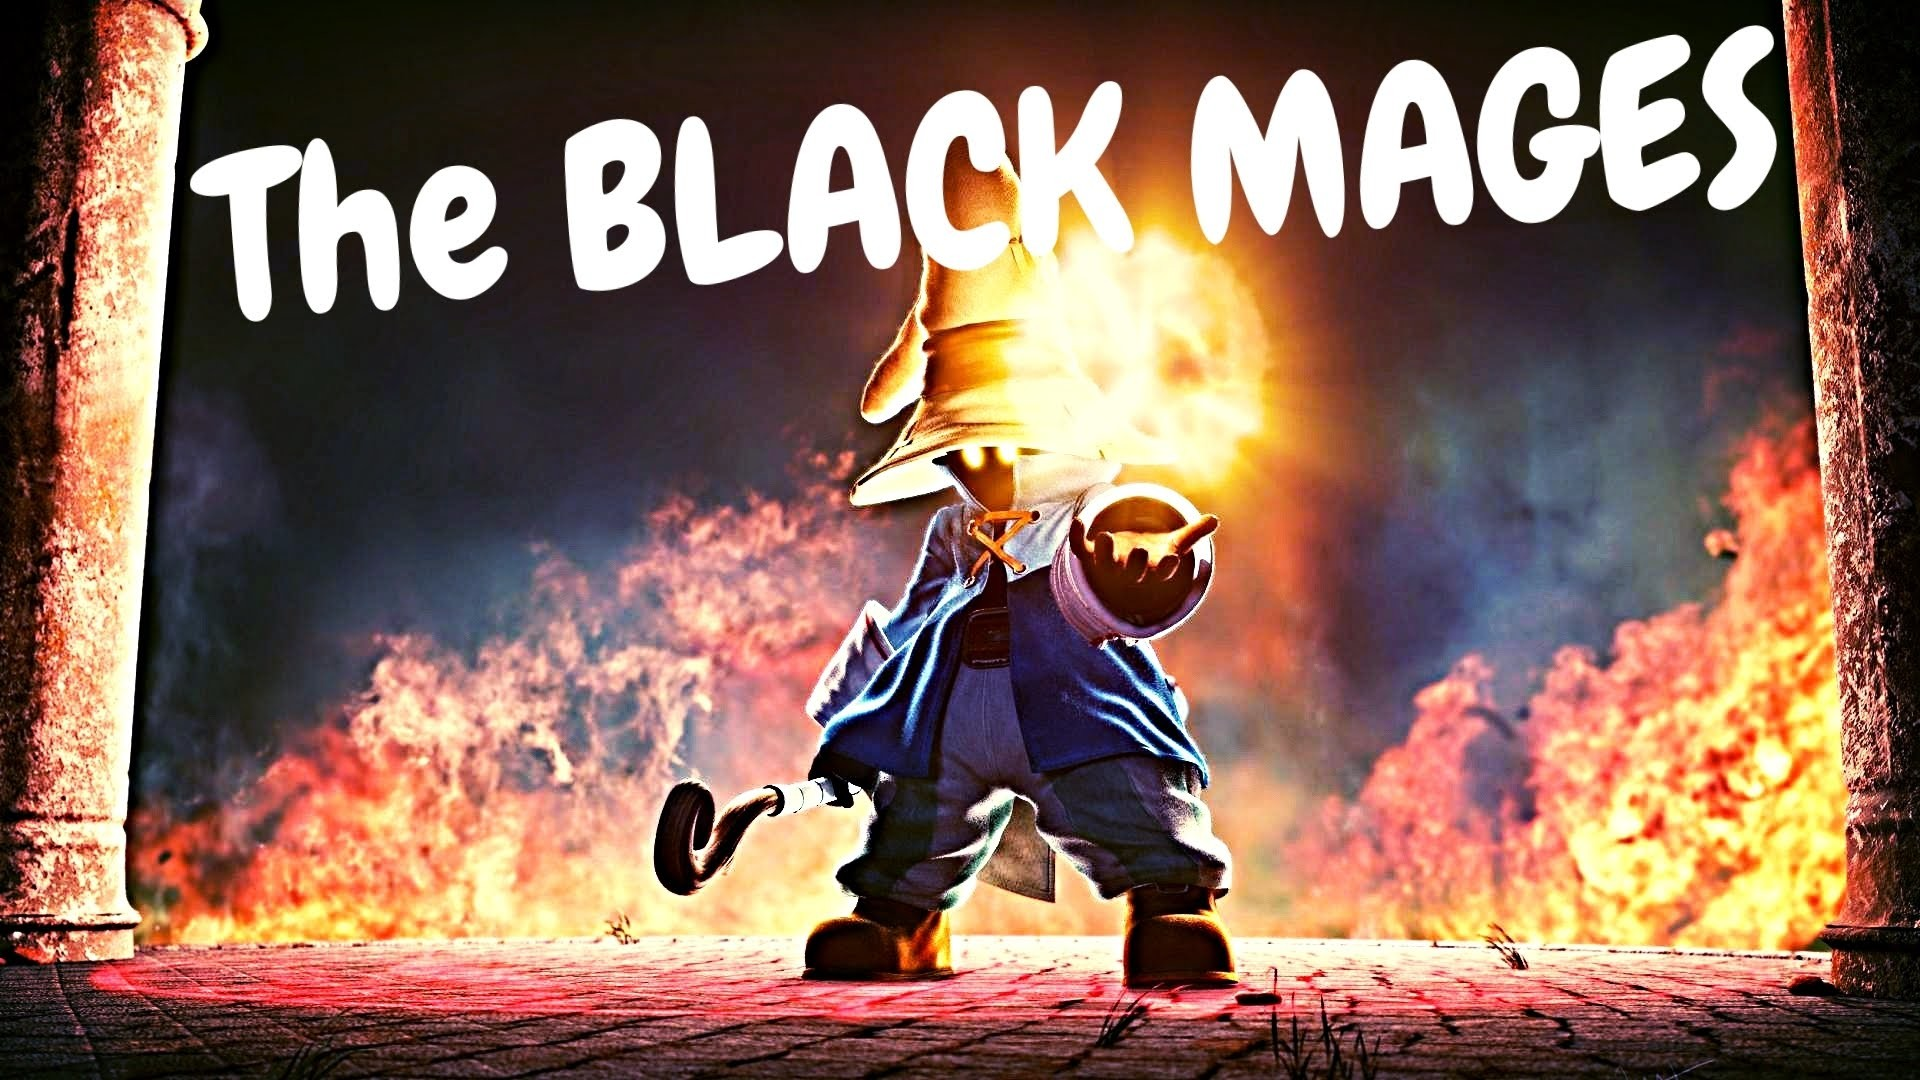 Final Fantasy: The Black Mages Full Album